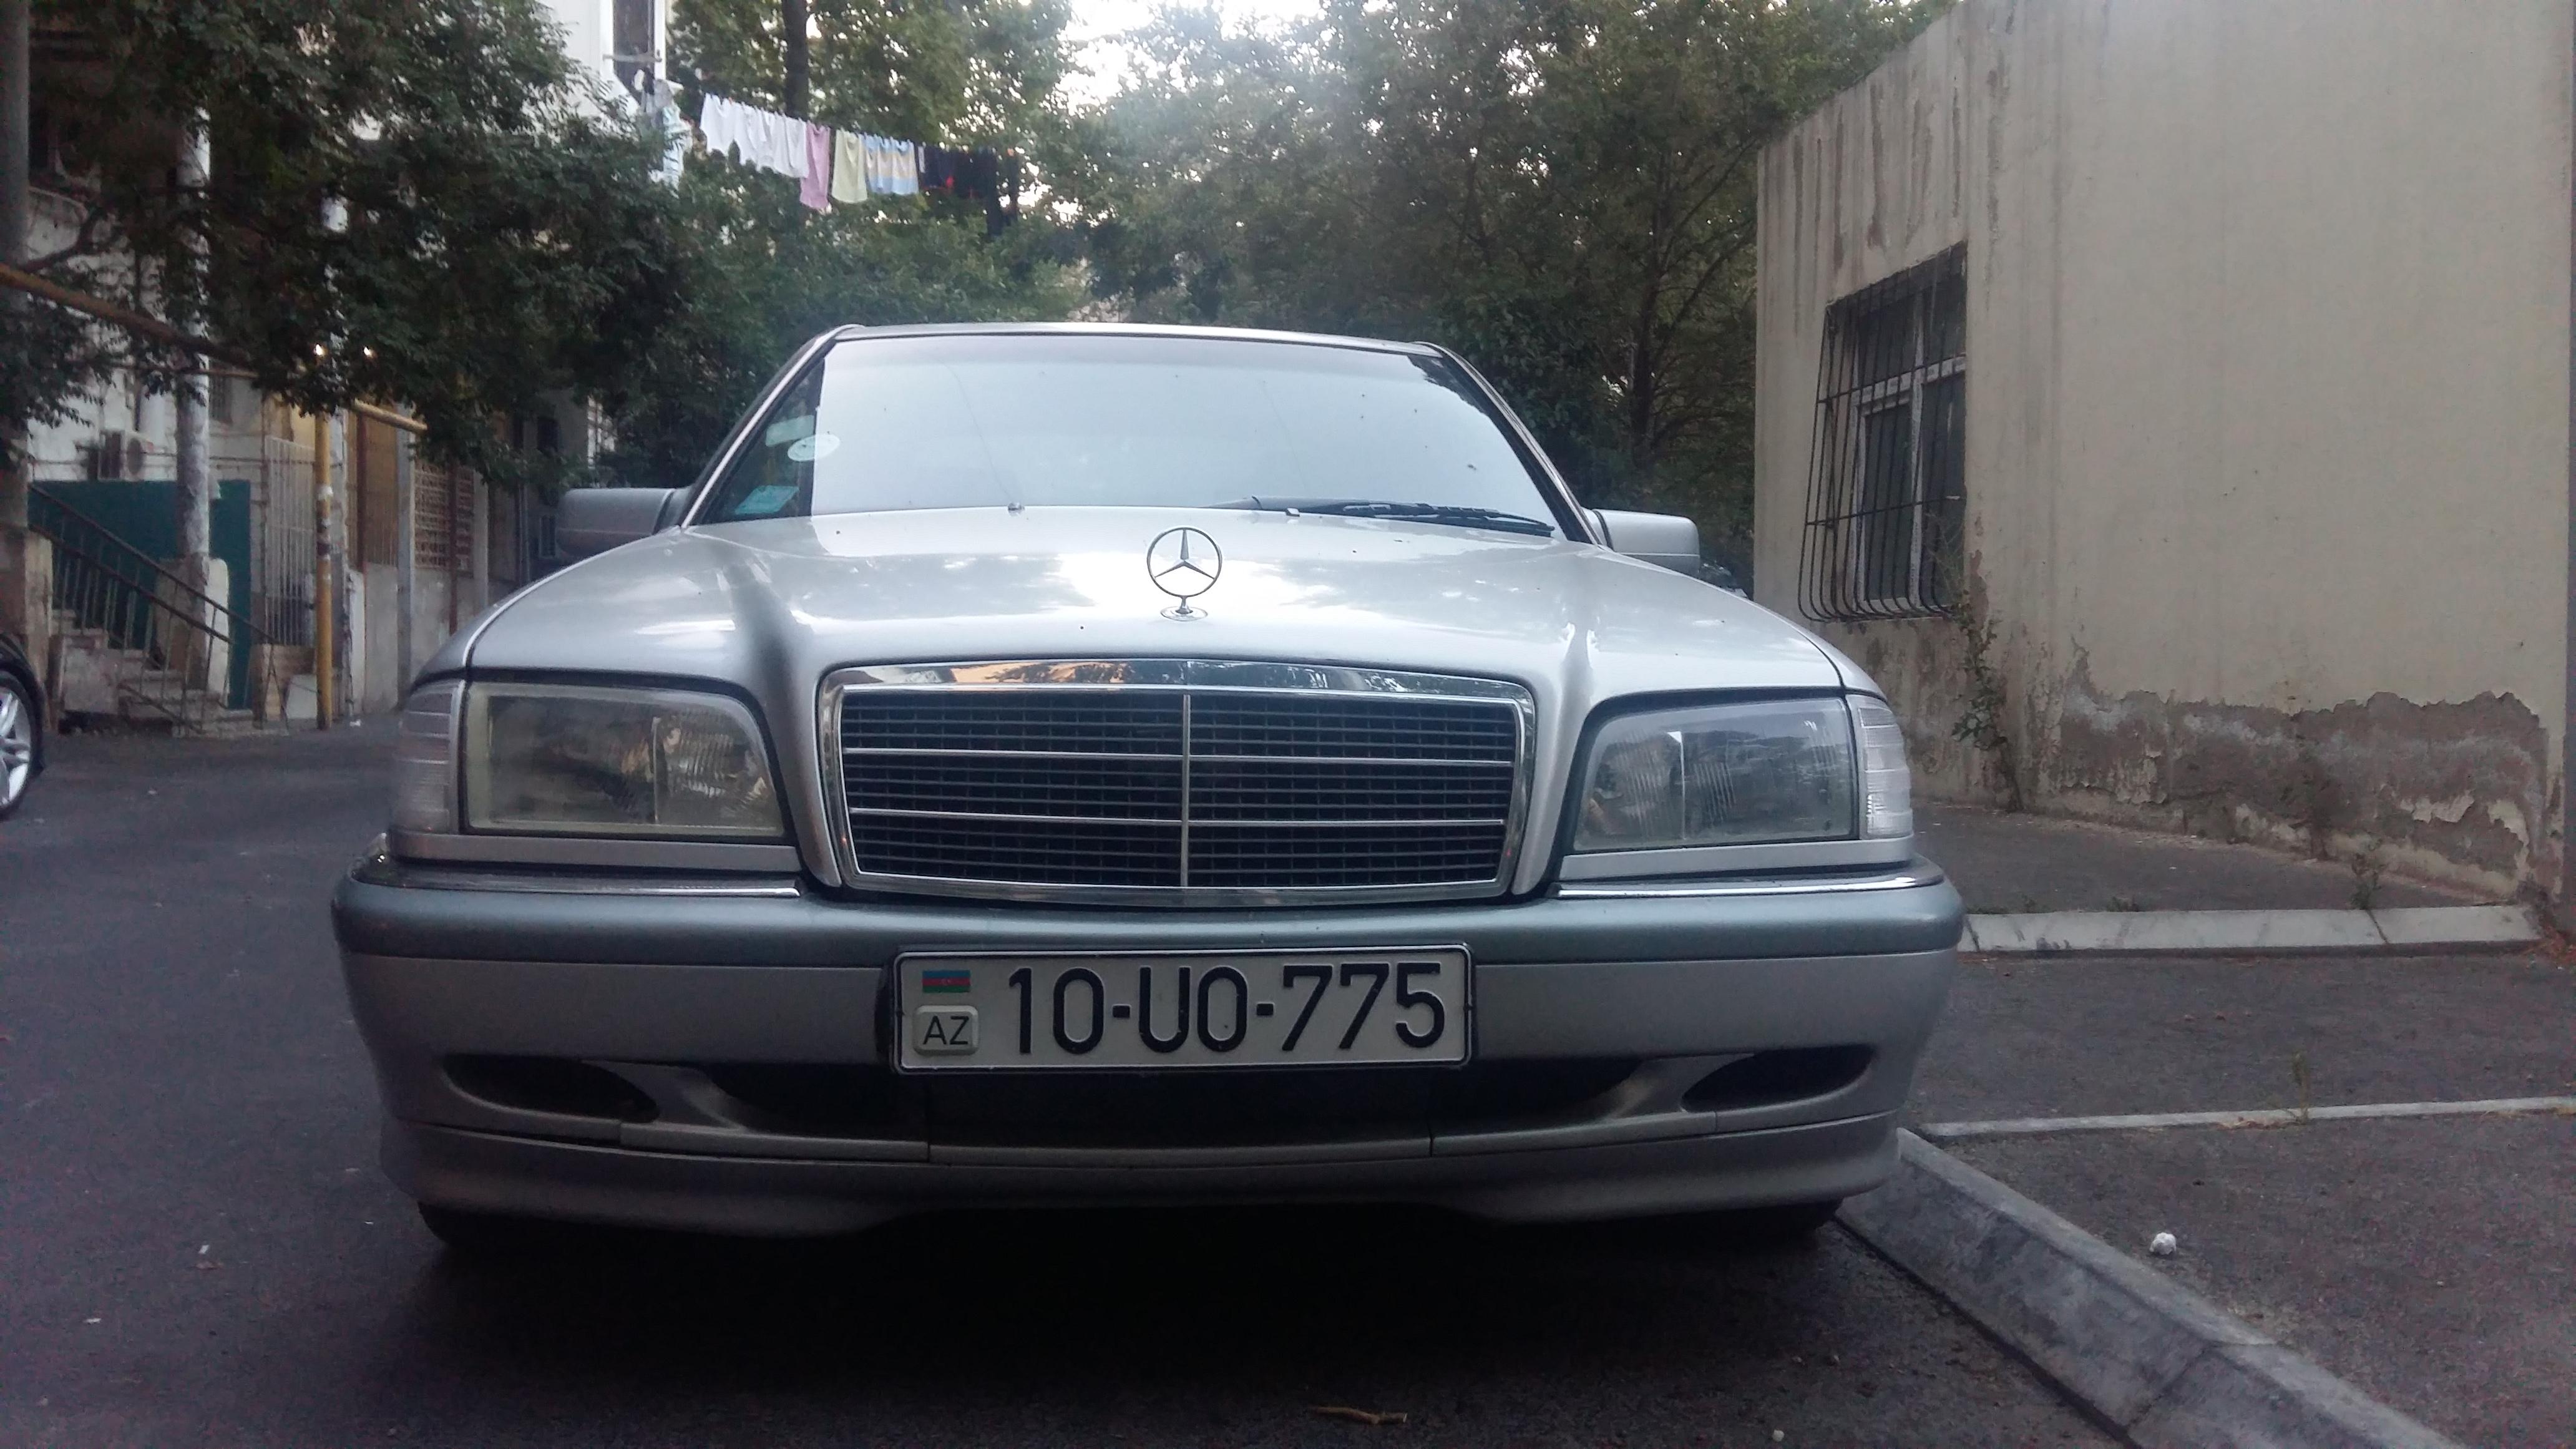 Mercedes-Benz C 230 2.3(lt) 1997 Second hand  $10000